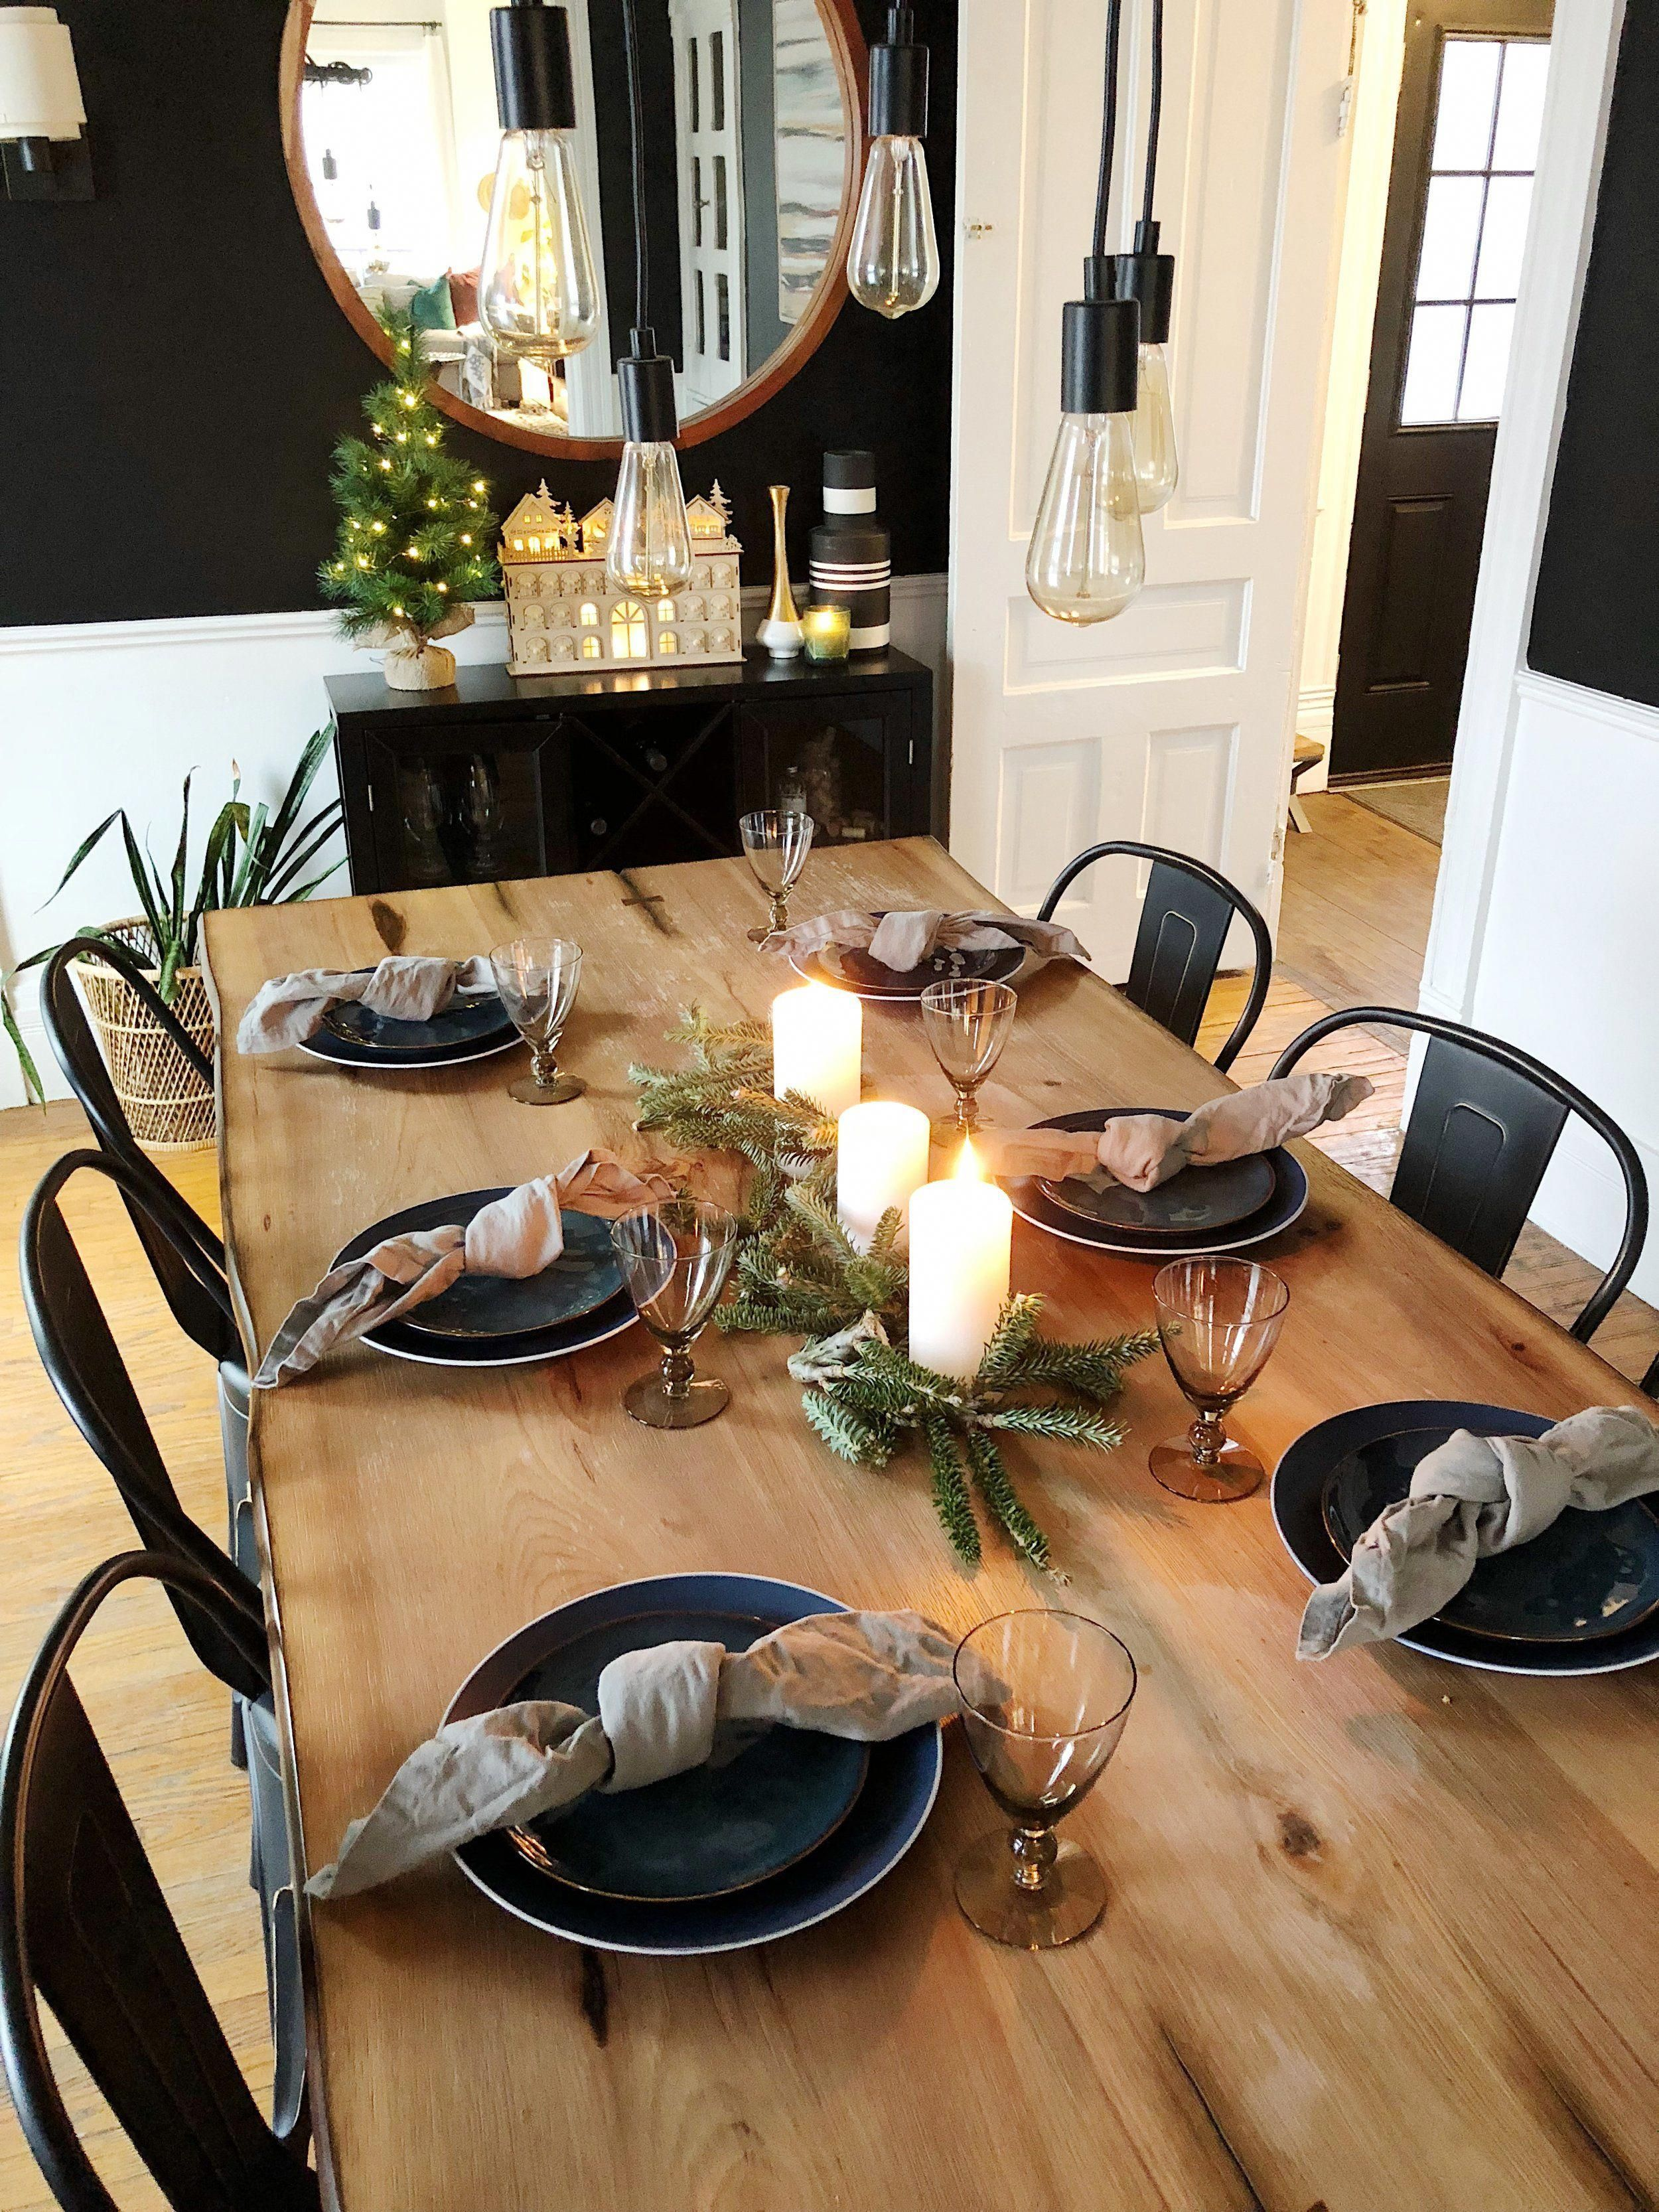 Top 12 Ideas De Lujo Sensacional De Restauración Habitación Que Wows Luxurydiningch Dining Room Table Decor Christmas Dining Room Decor Christmas Dining Room